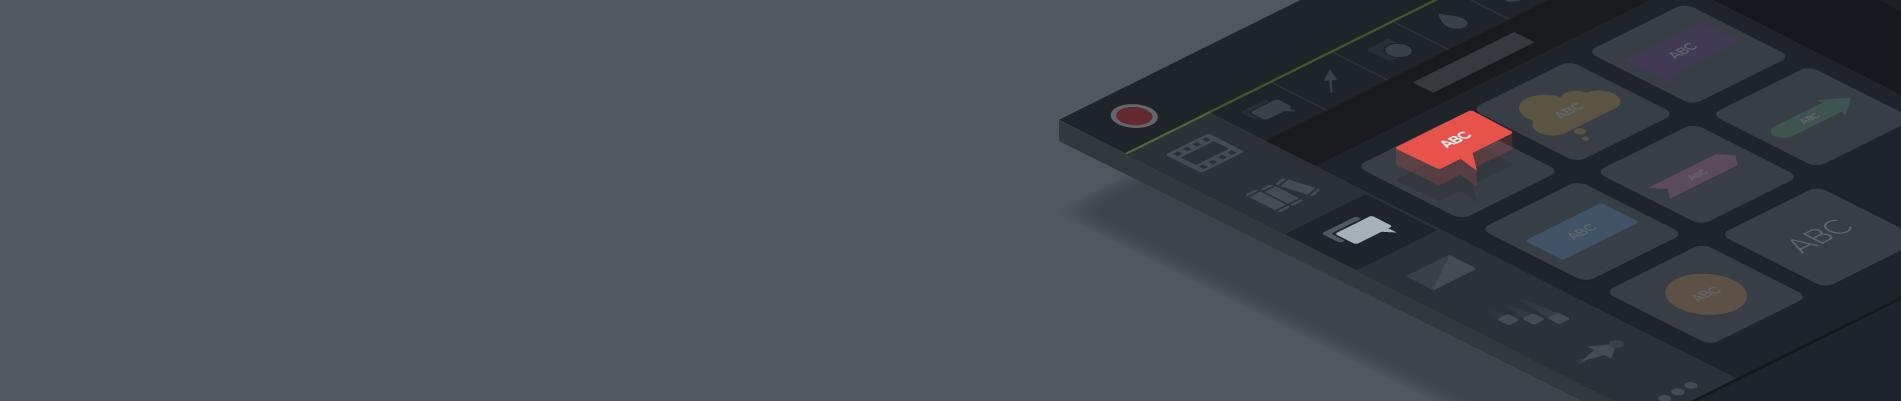 Annotations, Callouts & Custom Visuals | Camtasia | TechSmith